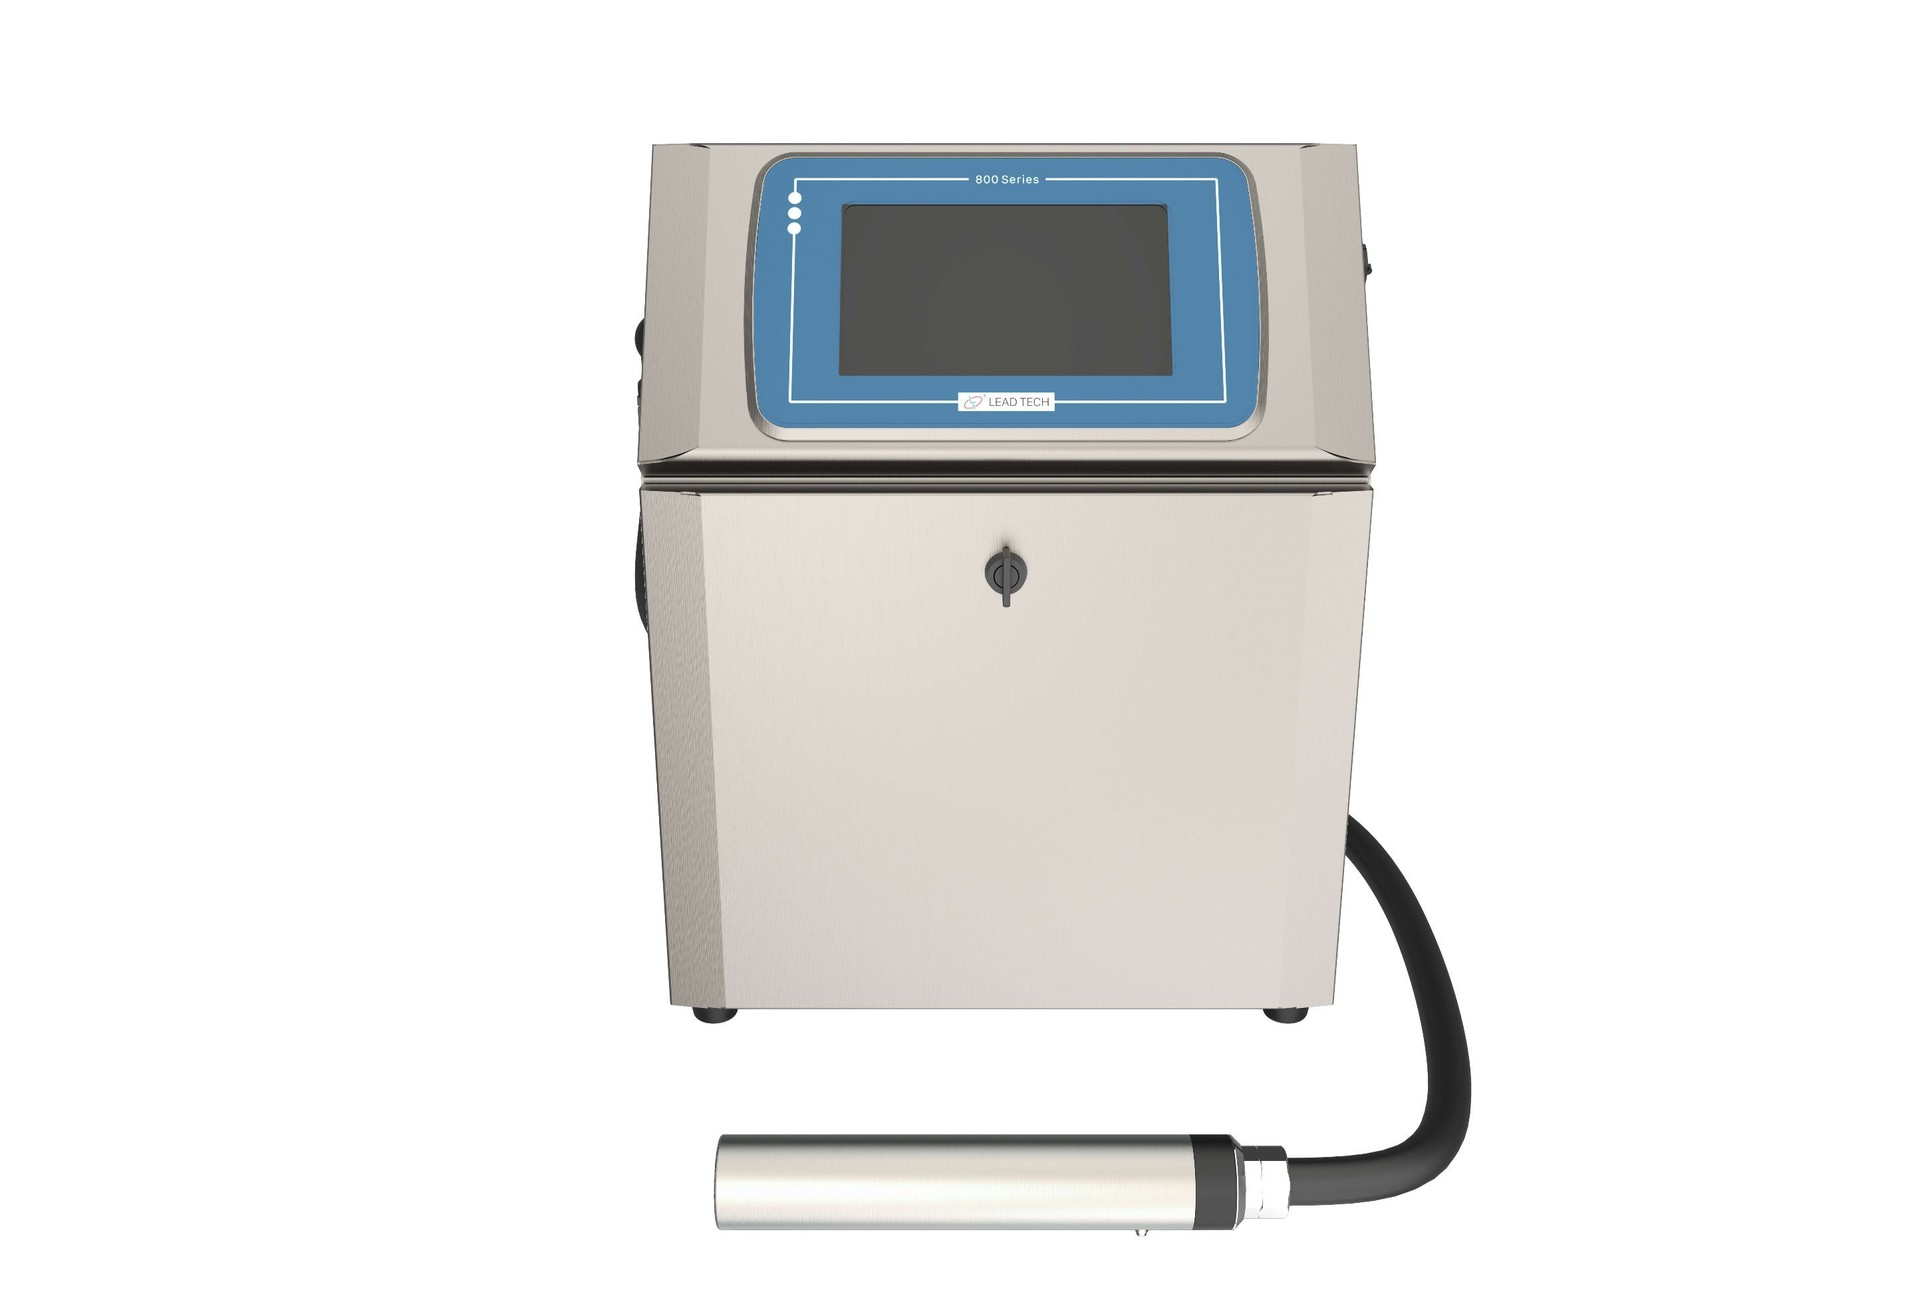 Lead Tech Lt800 Moving Head Printing Cij Inkjet Printer